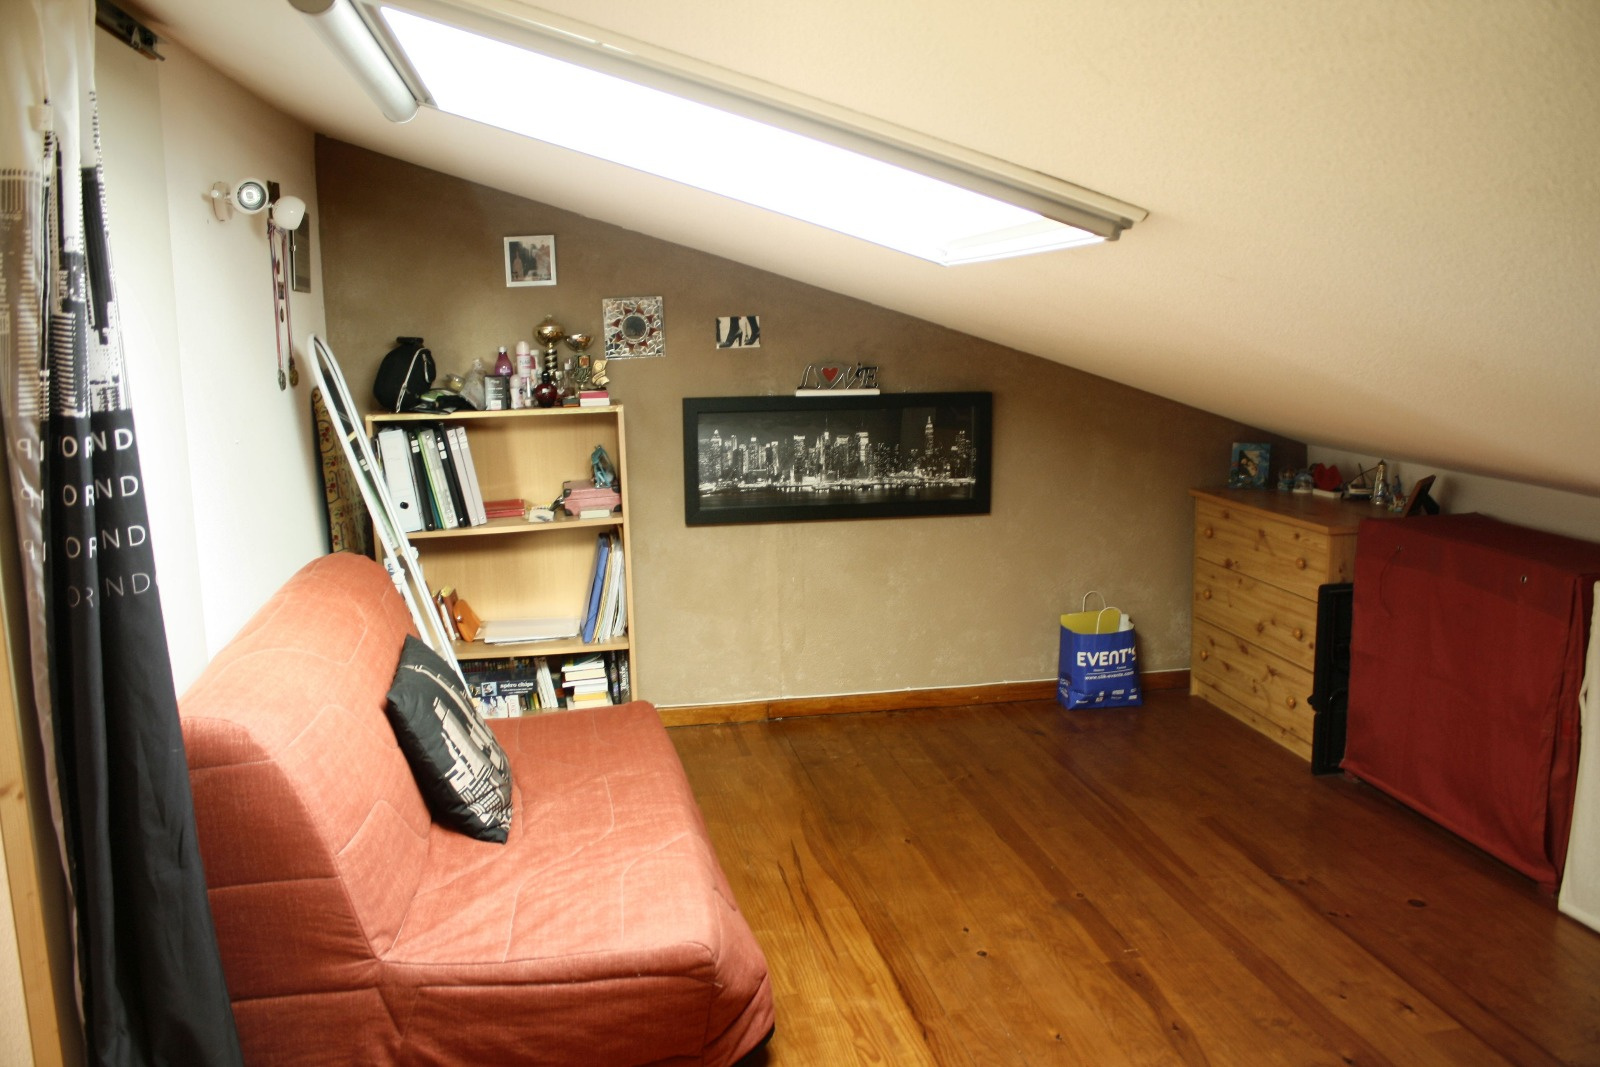 Vente collioure splendide duplex dans r sidence au calme for Acheter maison collioure